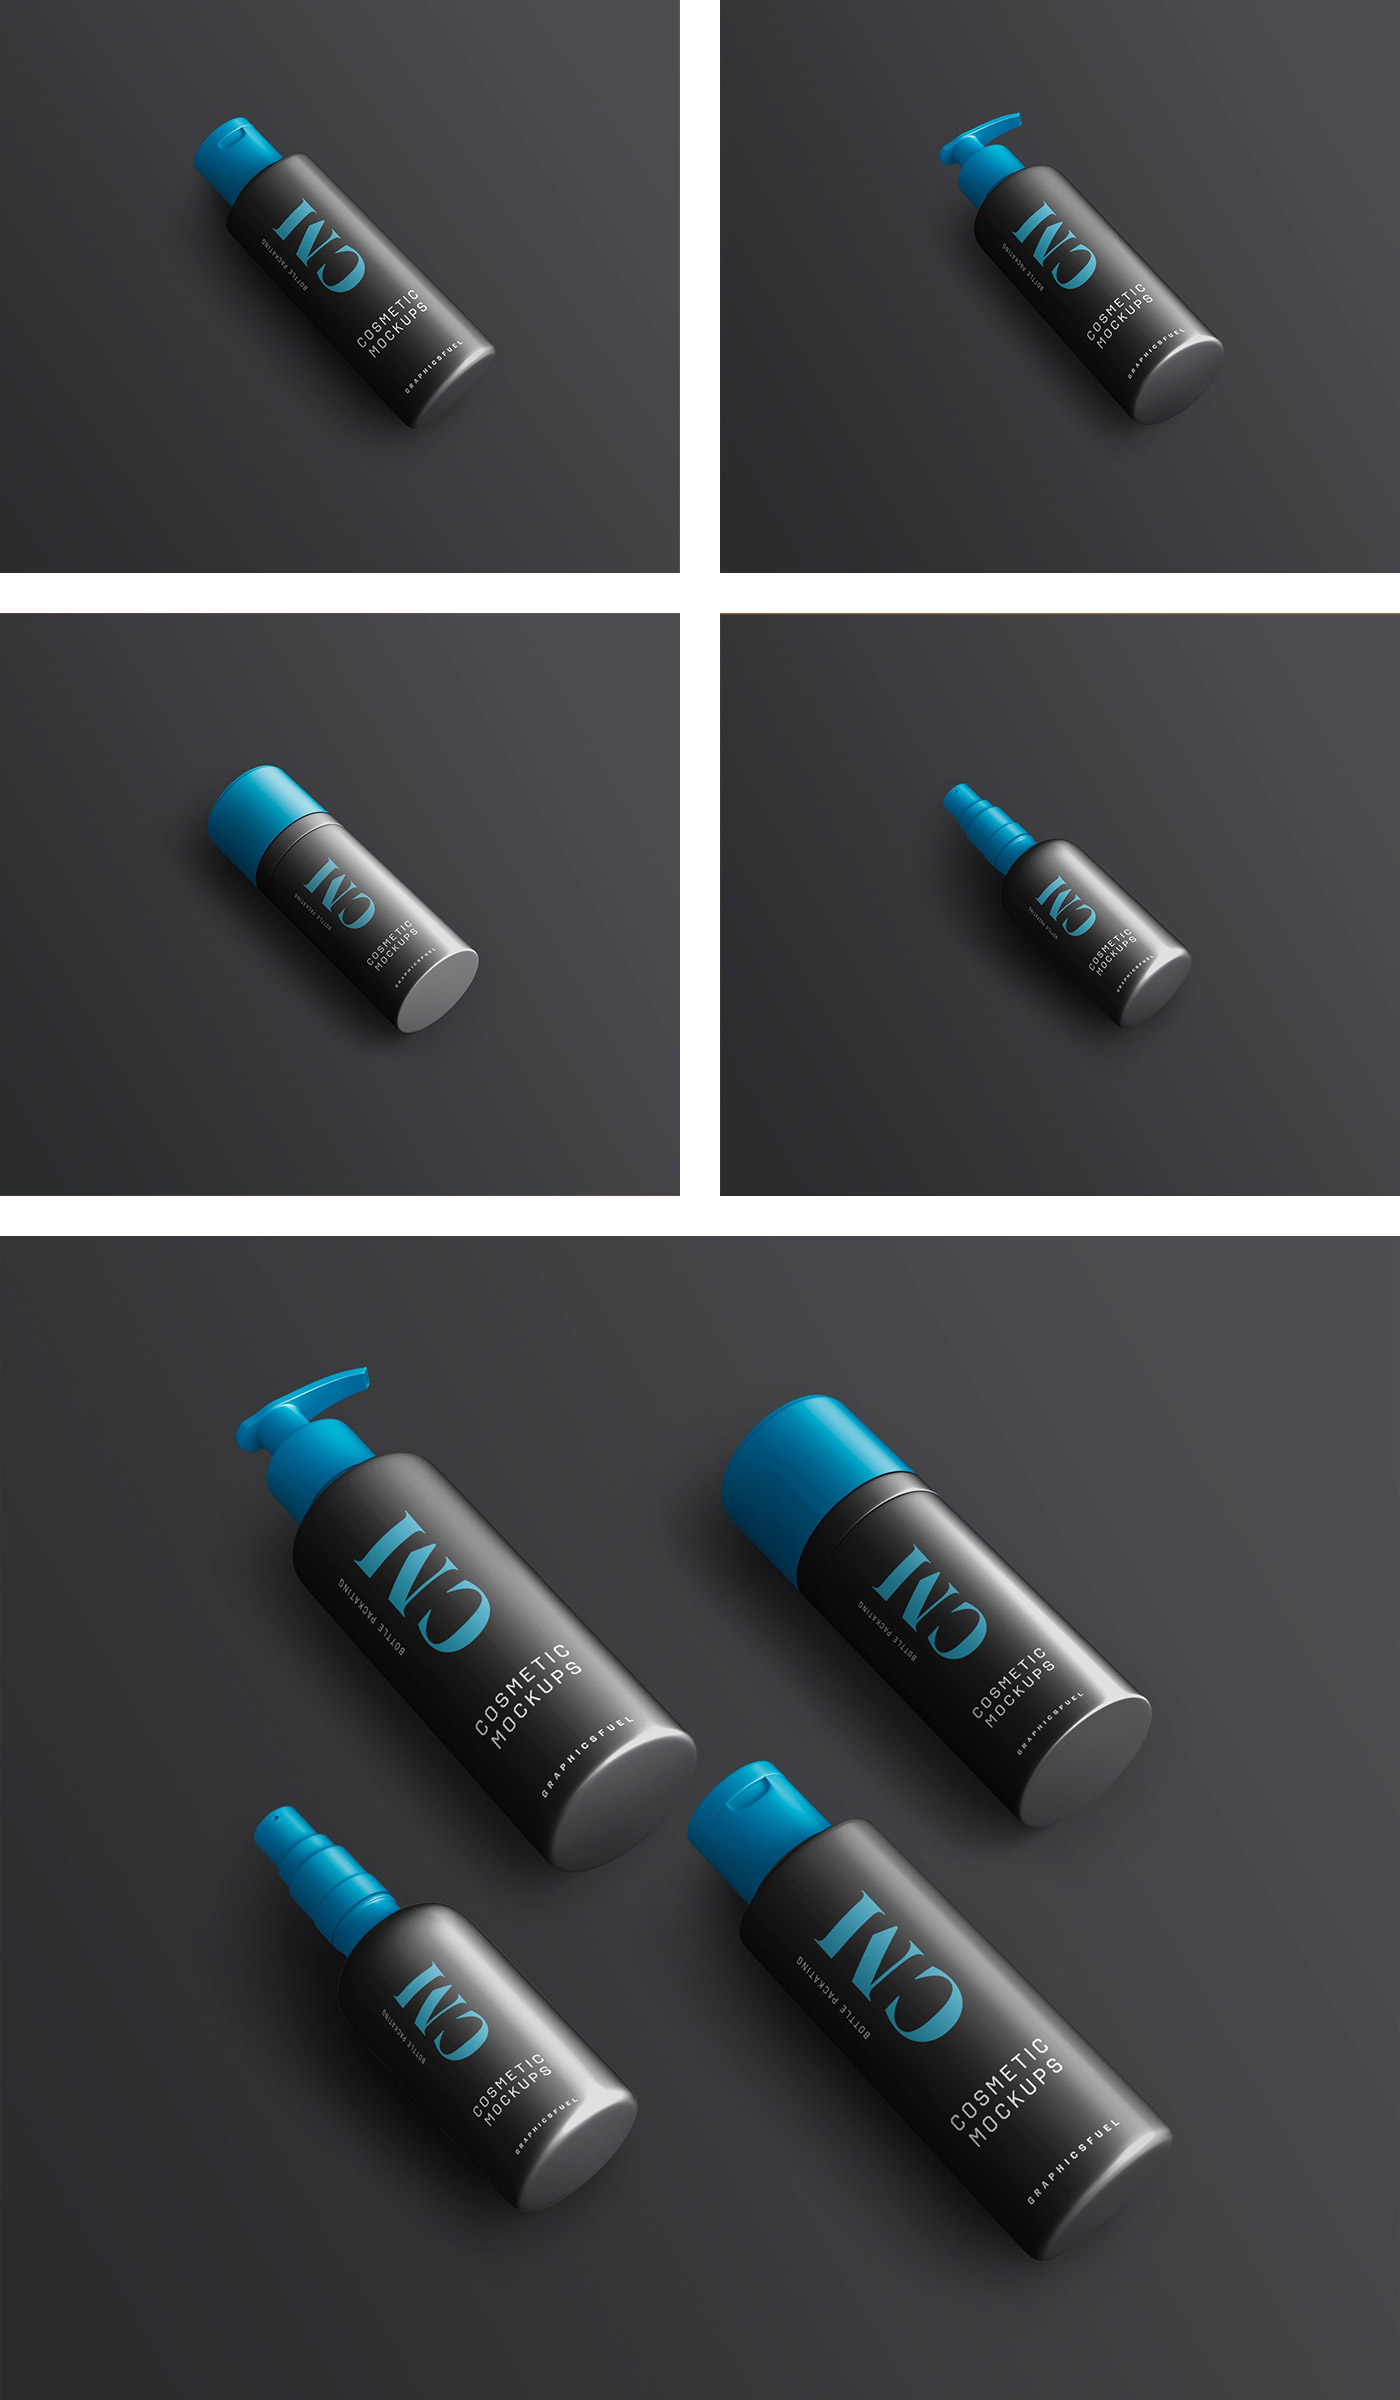 Cosmetic Product Bottle Dark Mockups